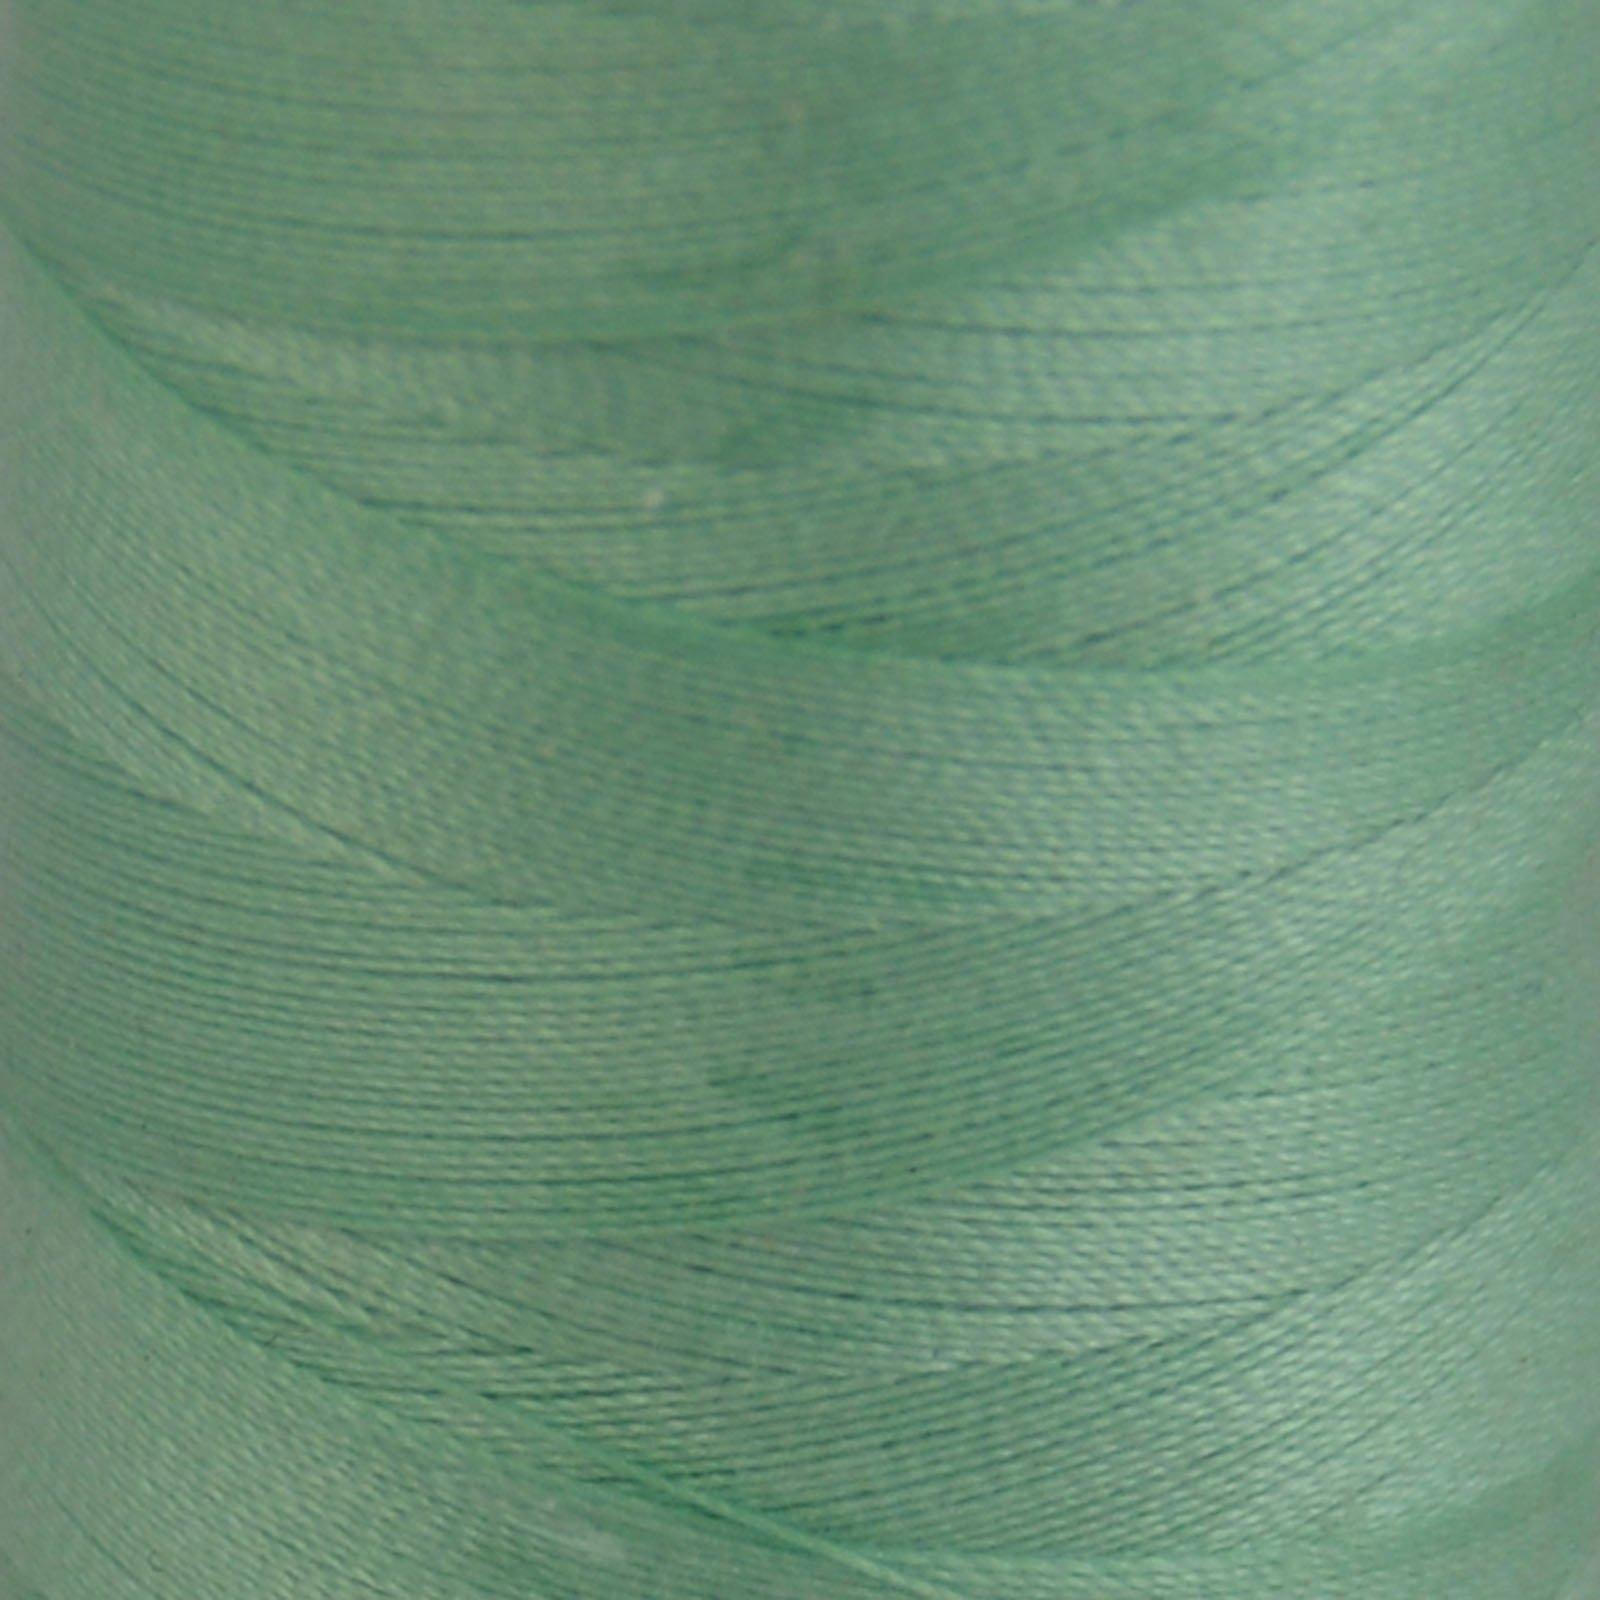 # 2835 Medium Mint